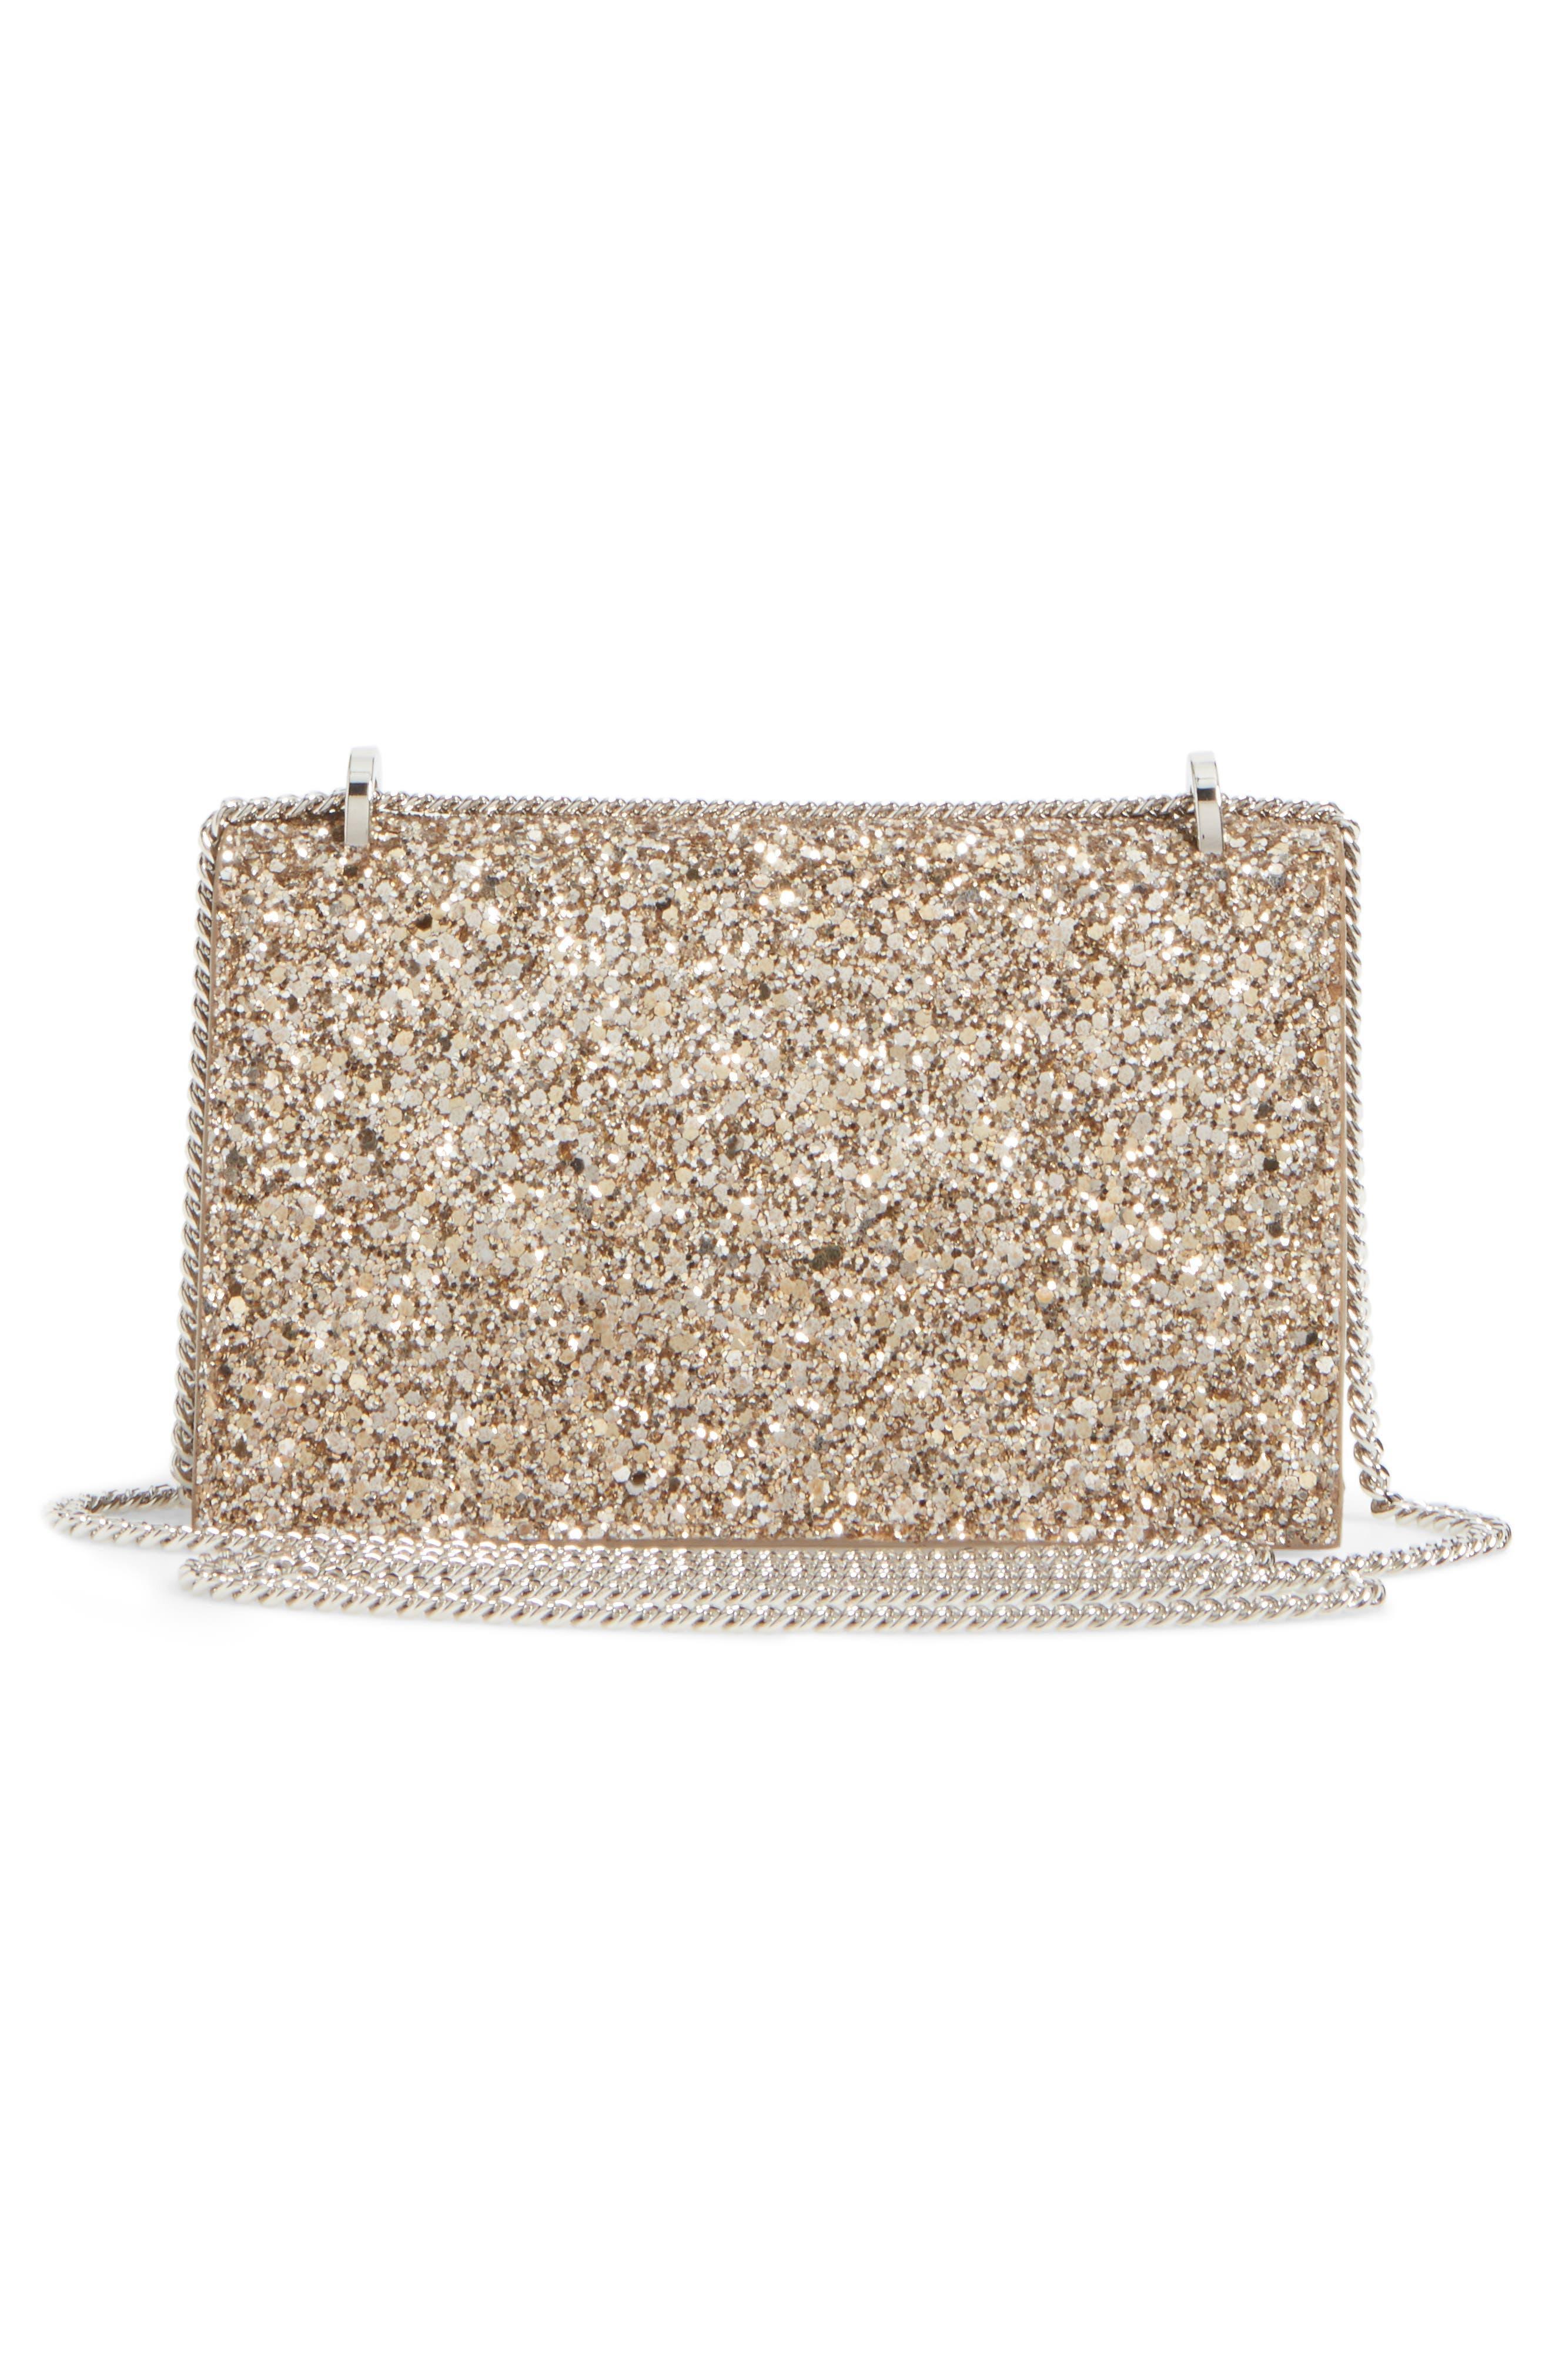 Finley Shadow Glitter Shoulder Bag,                             Alternate thumbnail 3, color,                             710